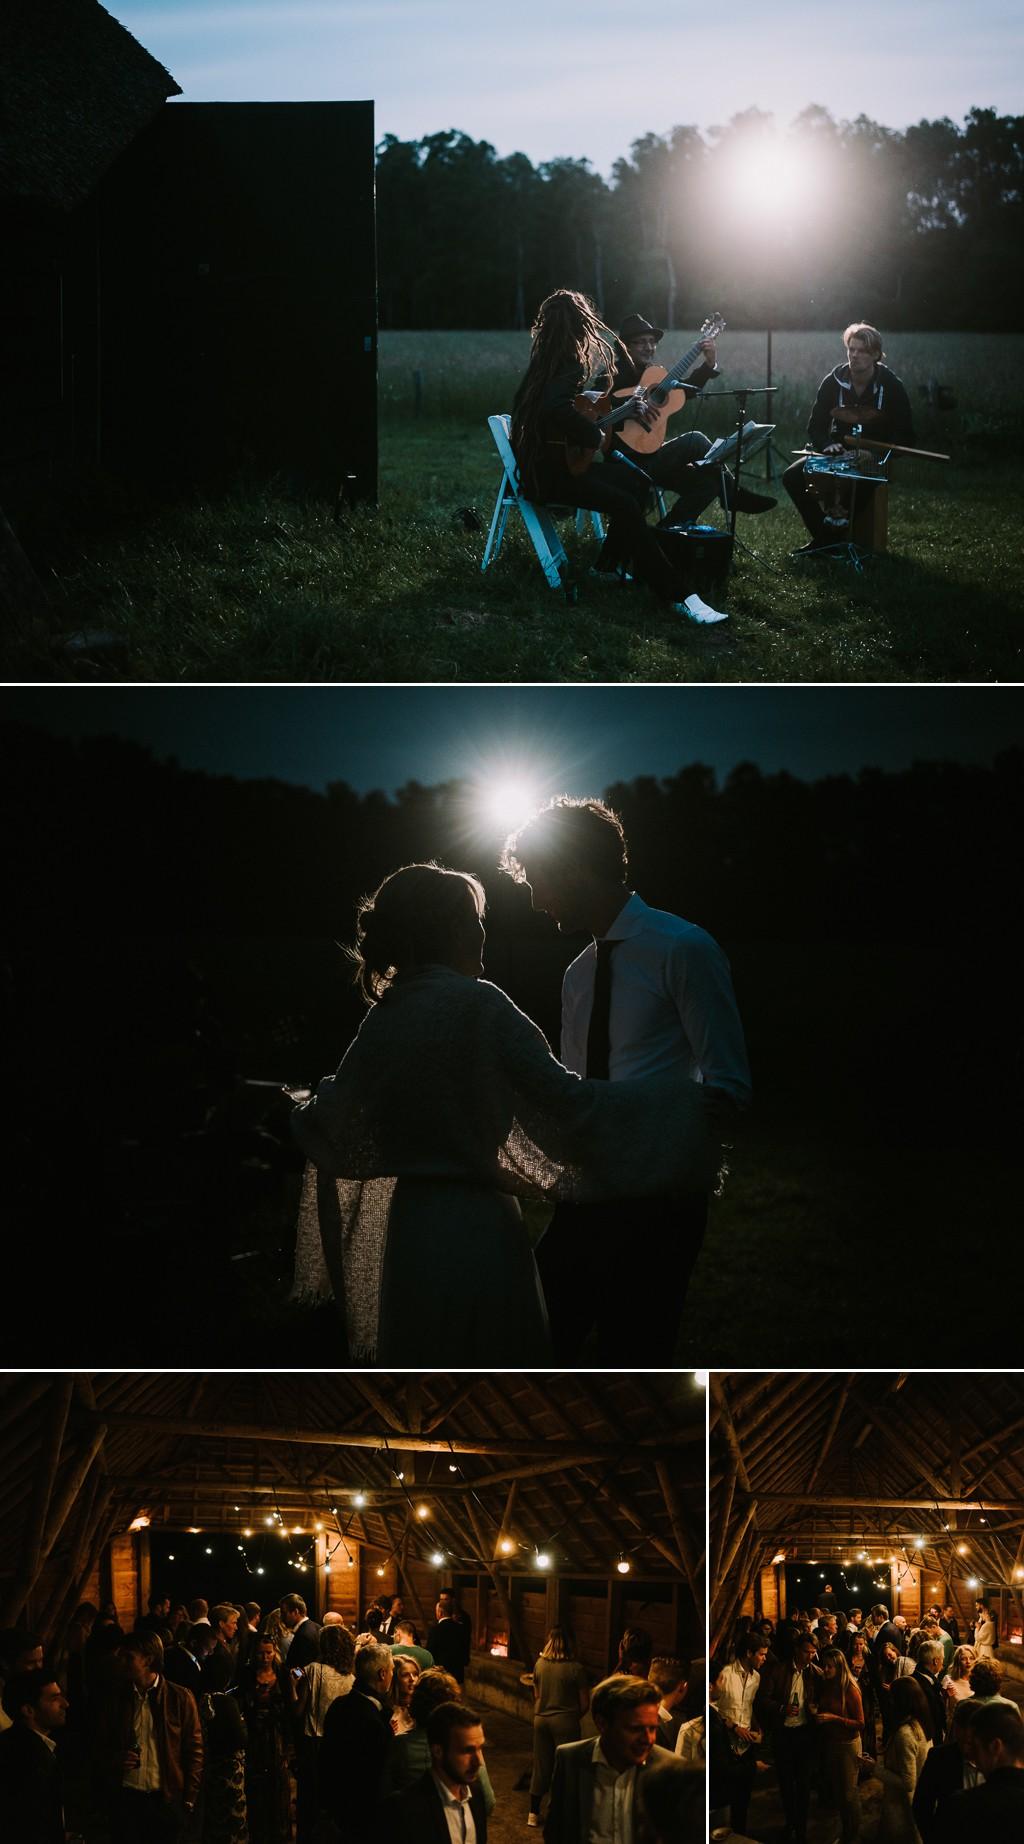 trouwfotograaf-rotterdam-trouwen-in-het-bos-arnhem-fotografie-steef-utama-w-w-14